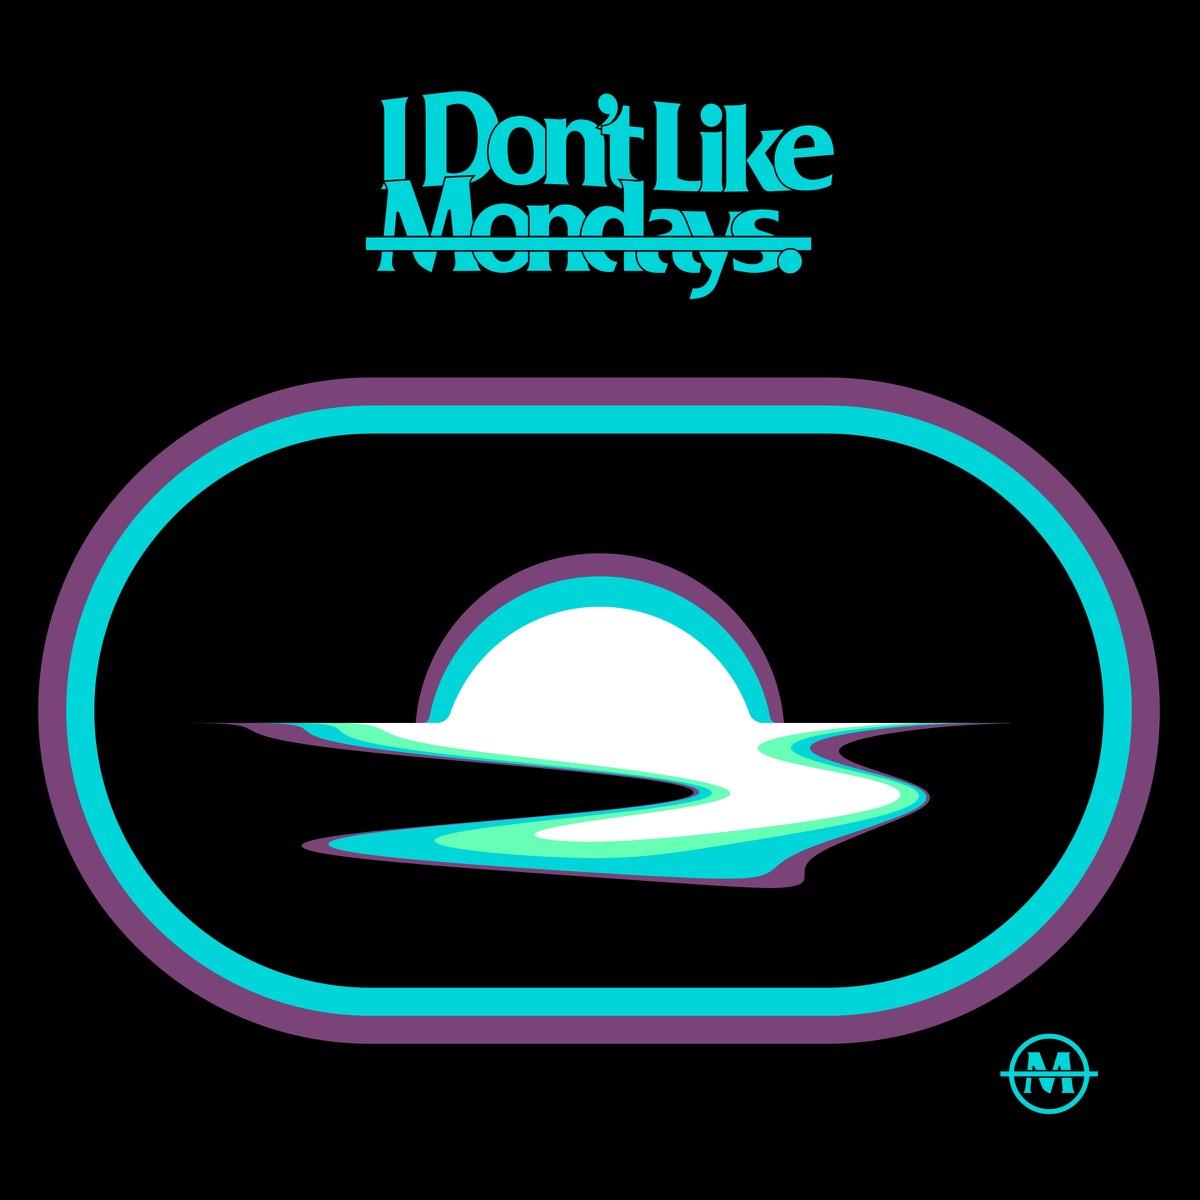 『I Don't Like Mondays. - 地上を夢見る魚』収録の『地上を夢見る魚』ジャケット